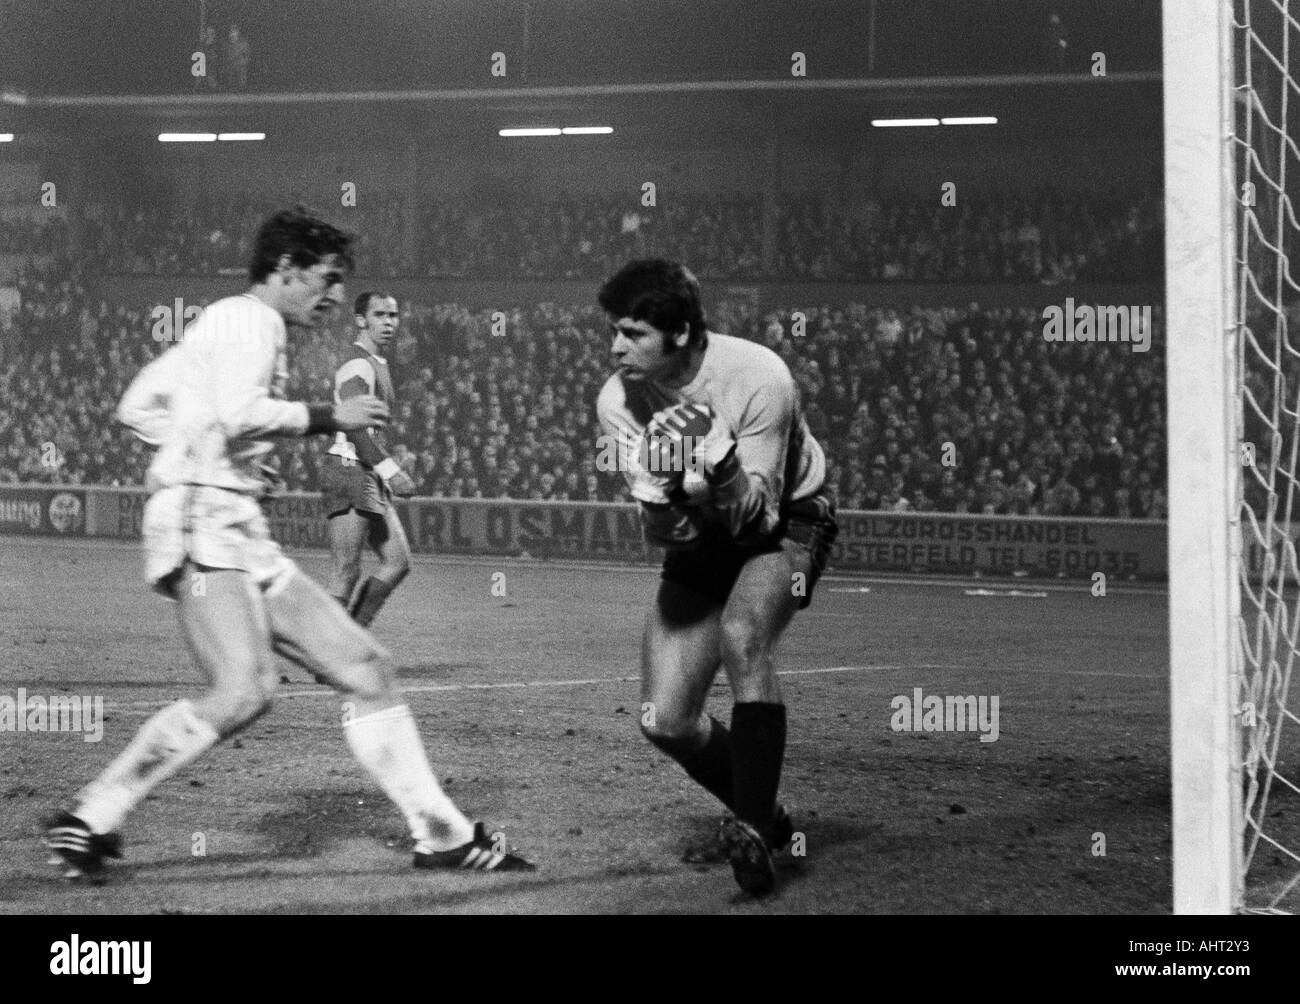 football, Bundesliga, 1970/1971, Niederrhein Stadium in Oberhausen, Rot-Weiss Oberhausen versus FC Bayern Munich 0:4, scene of the match, f.l.t.r. Edgar Schneider (FCB), Hermann Josef Wilbertz, keeper Wolfgang Scheid (both OB) - Stock Image